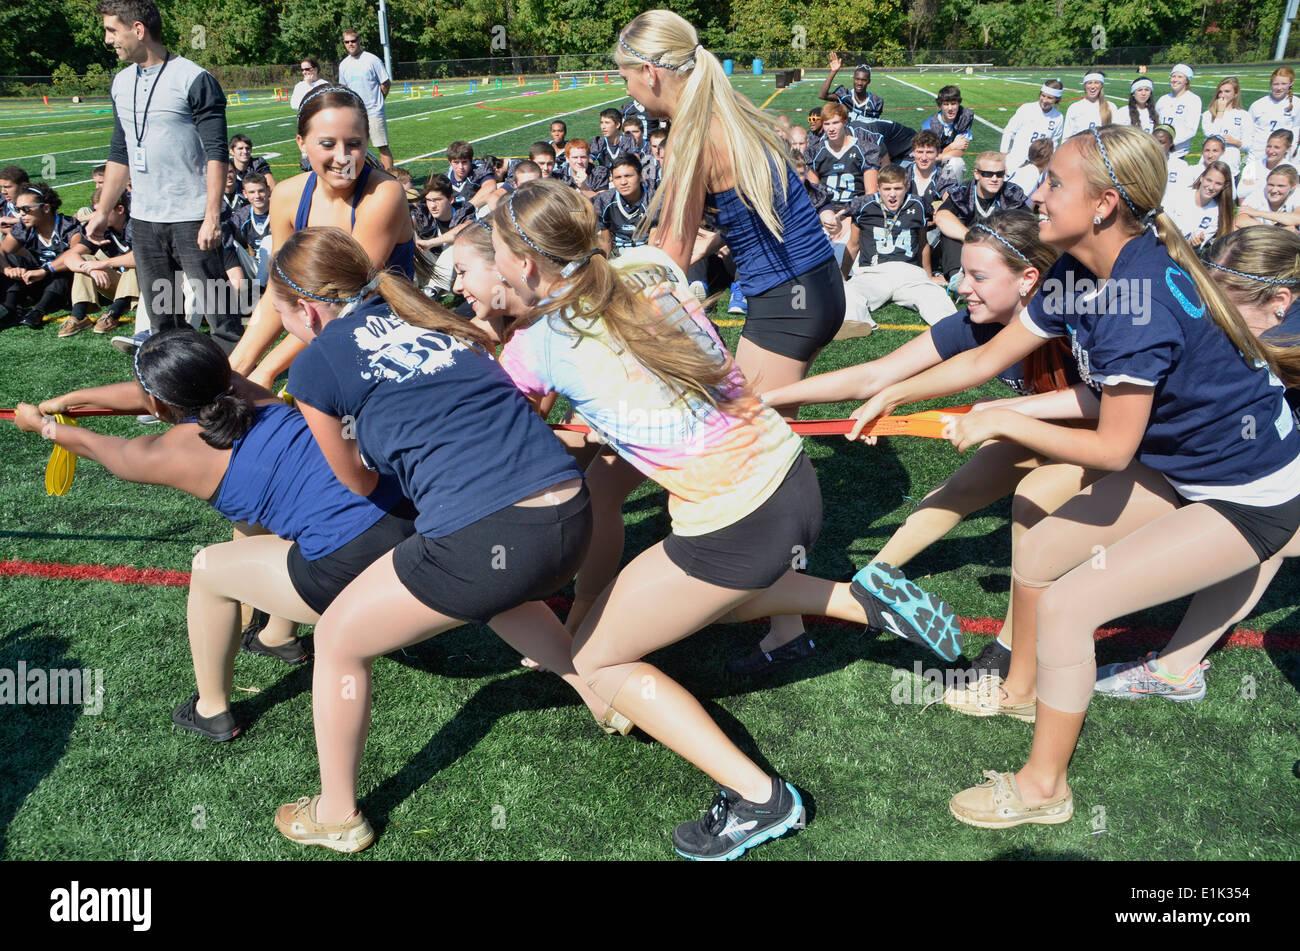 Teen Girls Playing A Tug Of War Game Stock Image